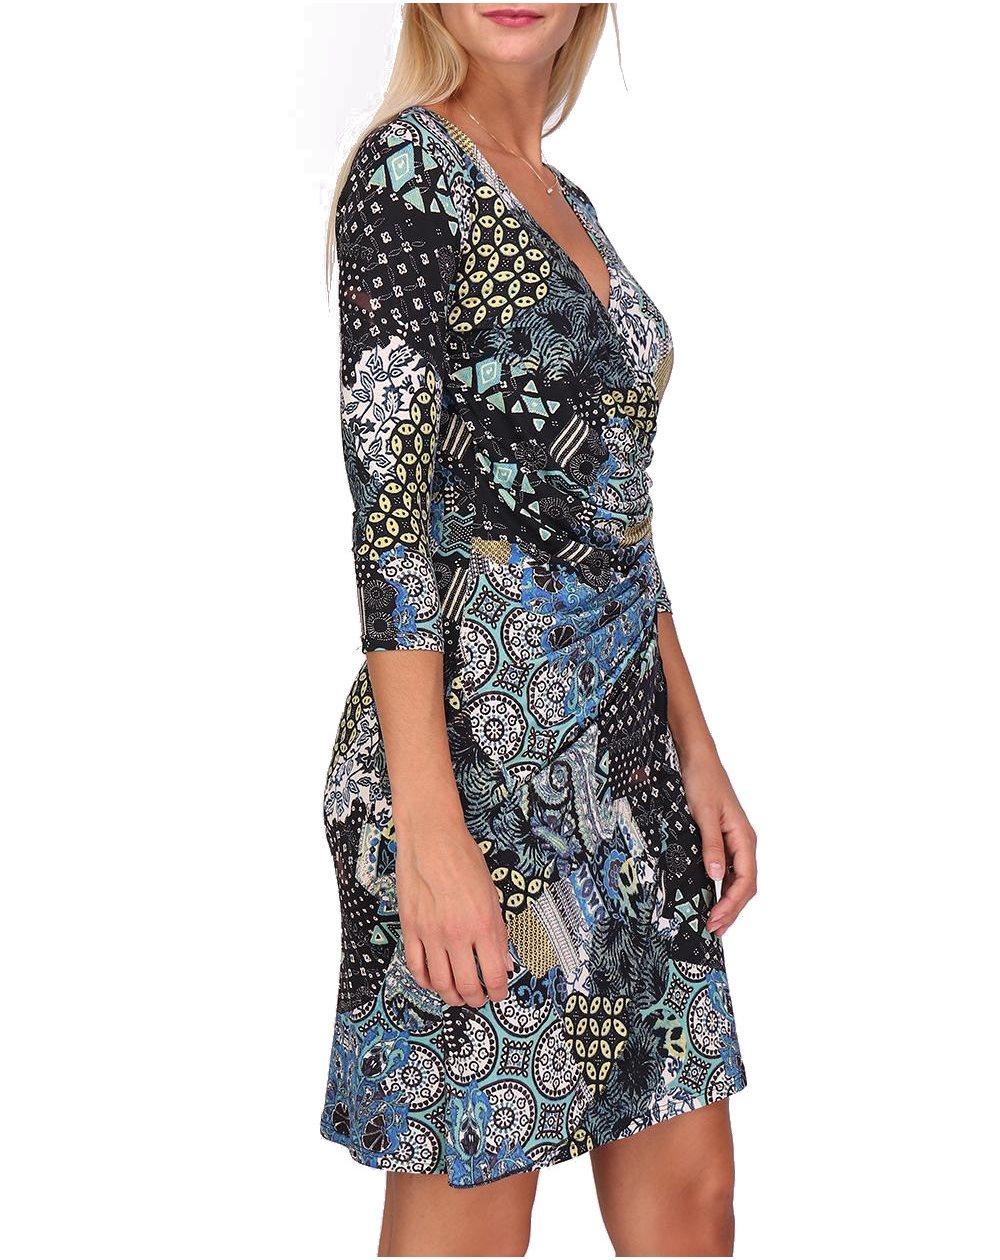 Robe Cache Coeur Col V Made in France Manches 3//4 pour Femme Imprimer Fleurs Myriam Revdelle